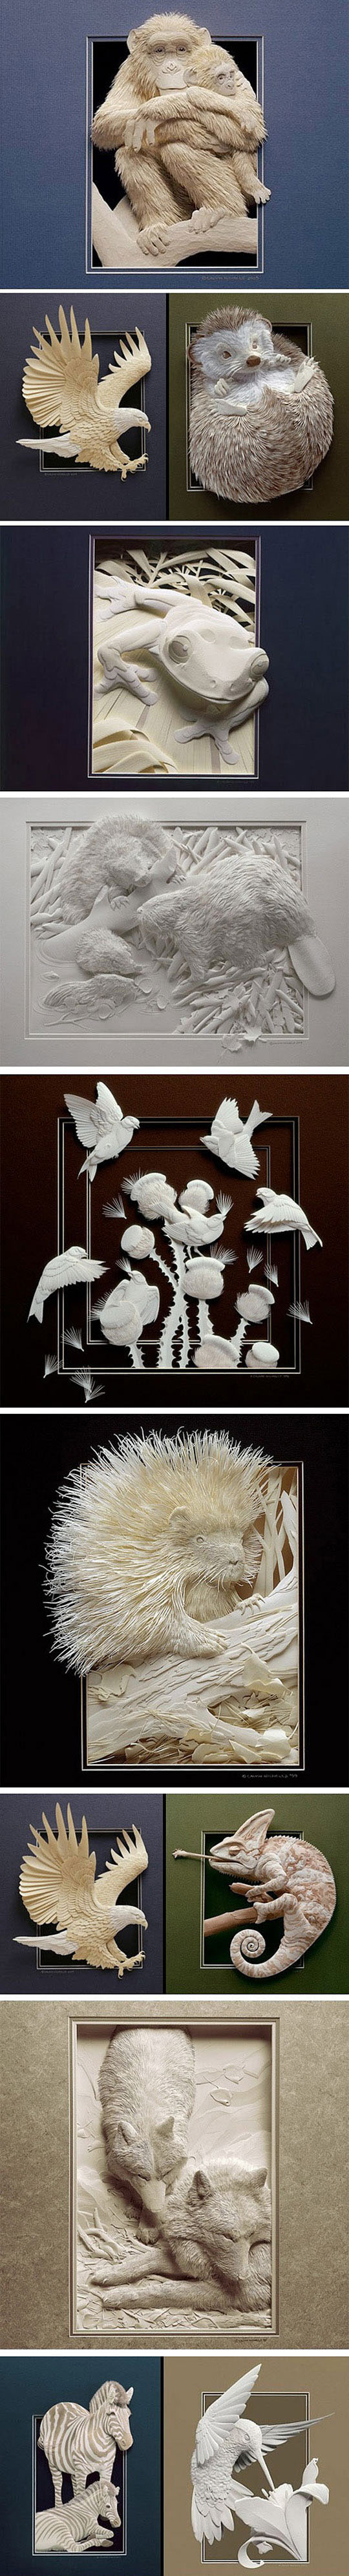 Captivating Paper Art By Calvin Nicholls1